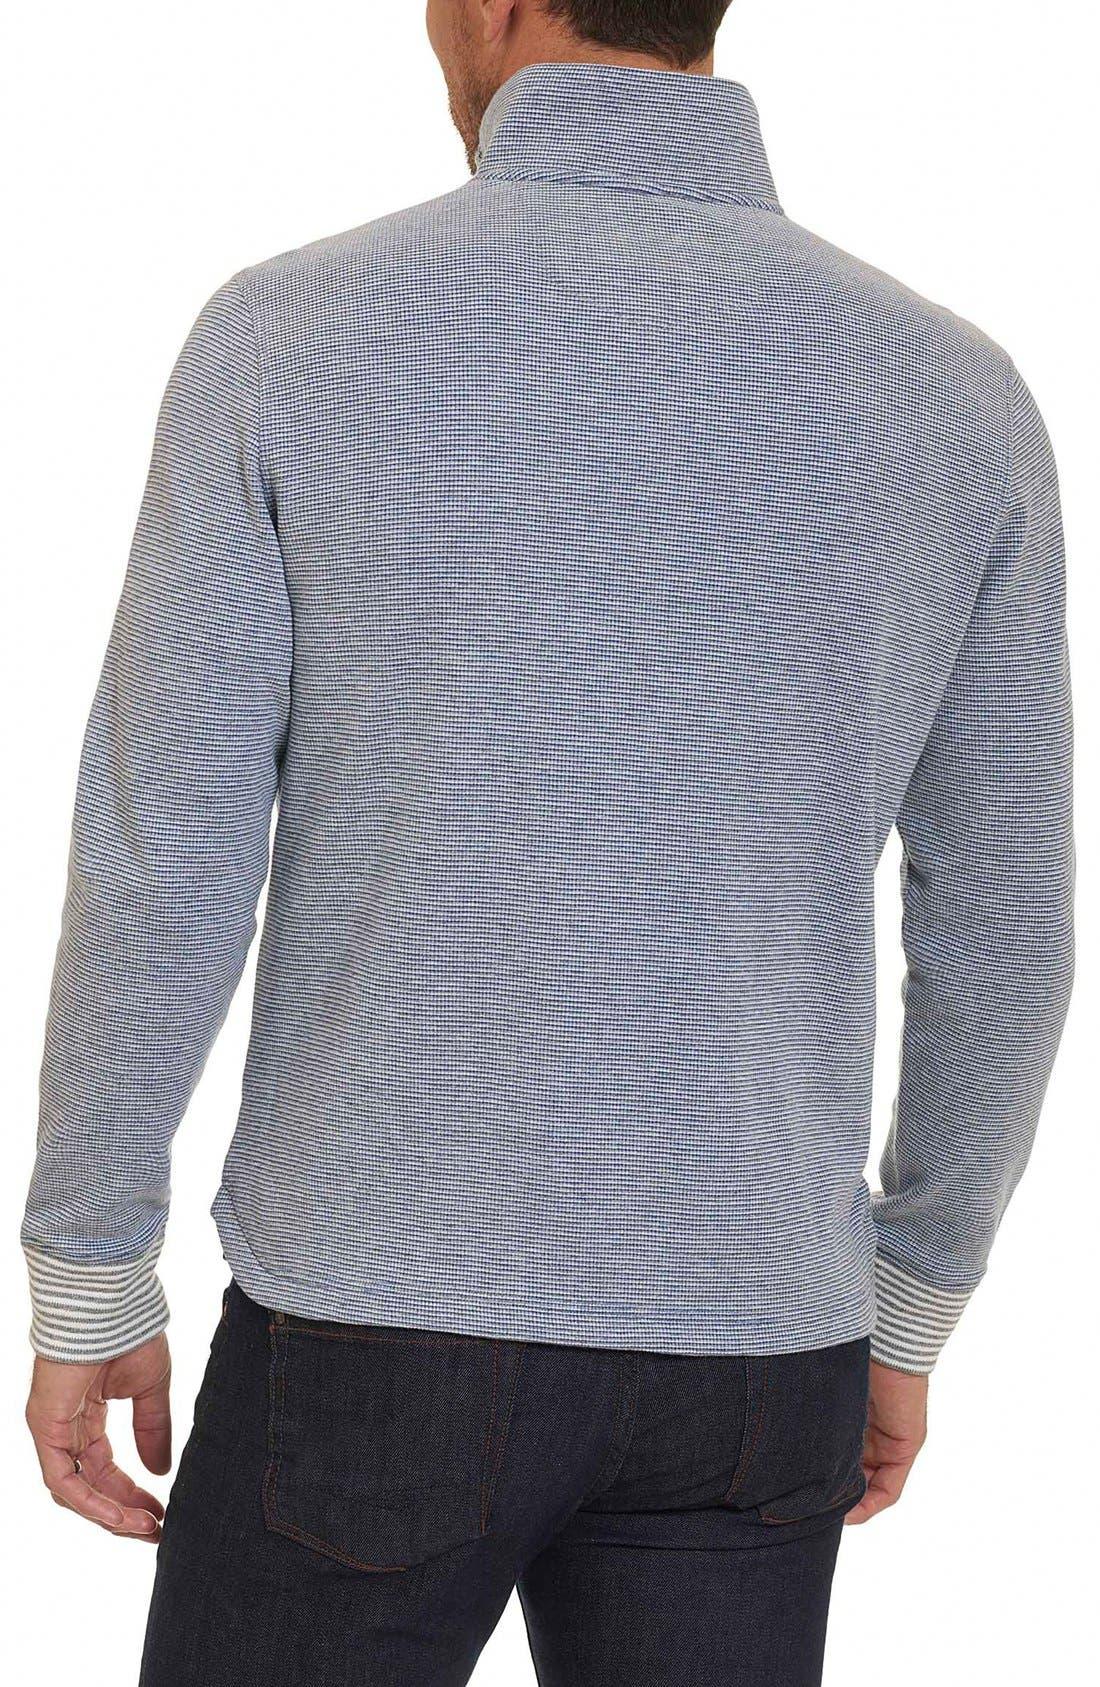 Poole Regular Fit Quarter Zip Pullover,                             Alternate thumbnail 3, color,                             020